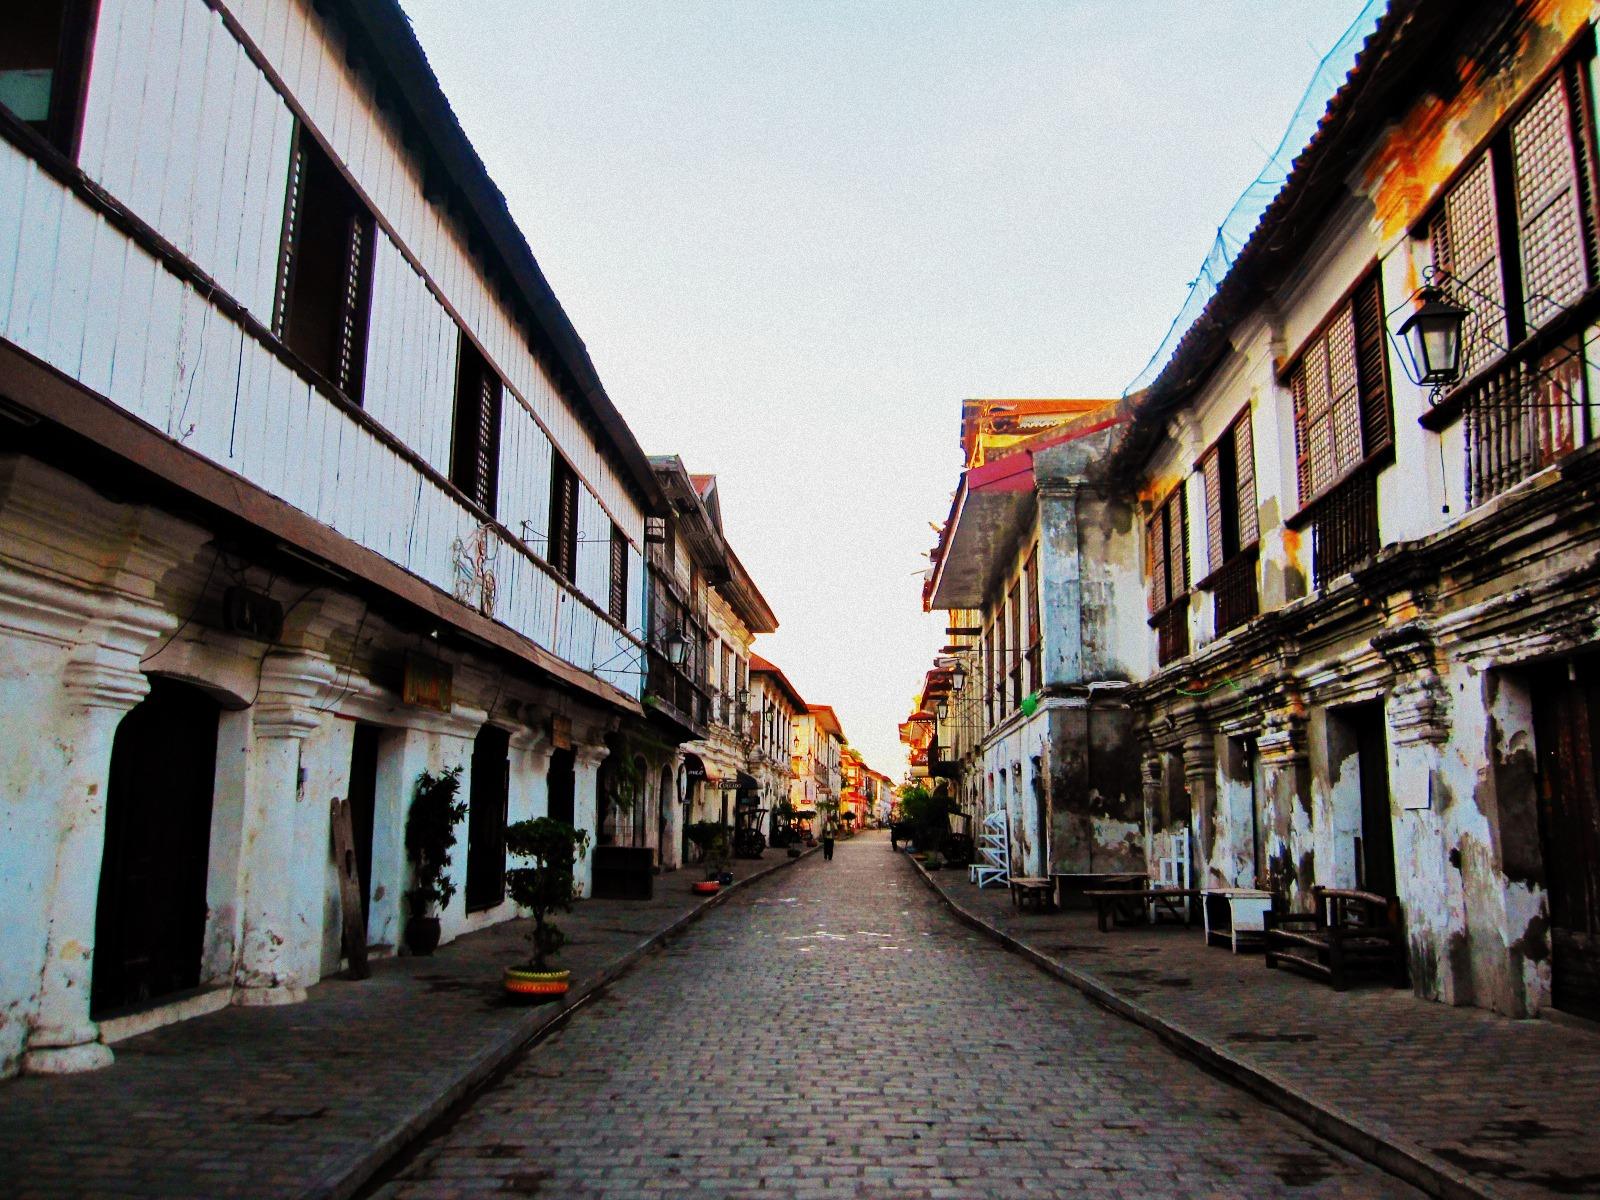 Take Me To The Nearest Gas Station >> Kookie Kulasa: My North Luzon Misadventure (Part 4)